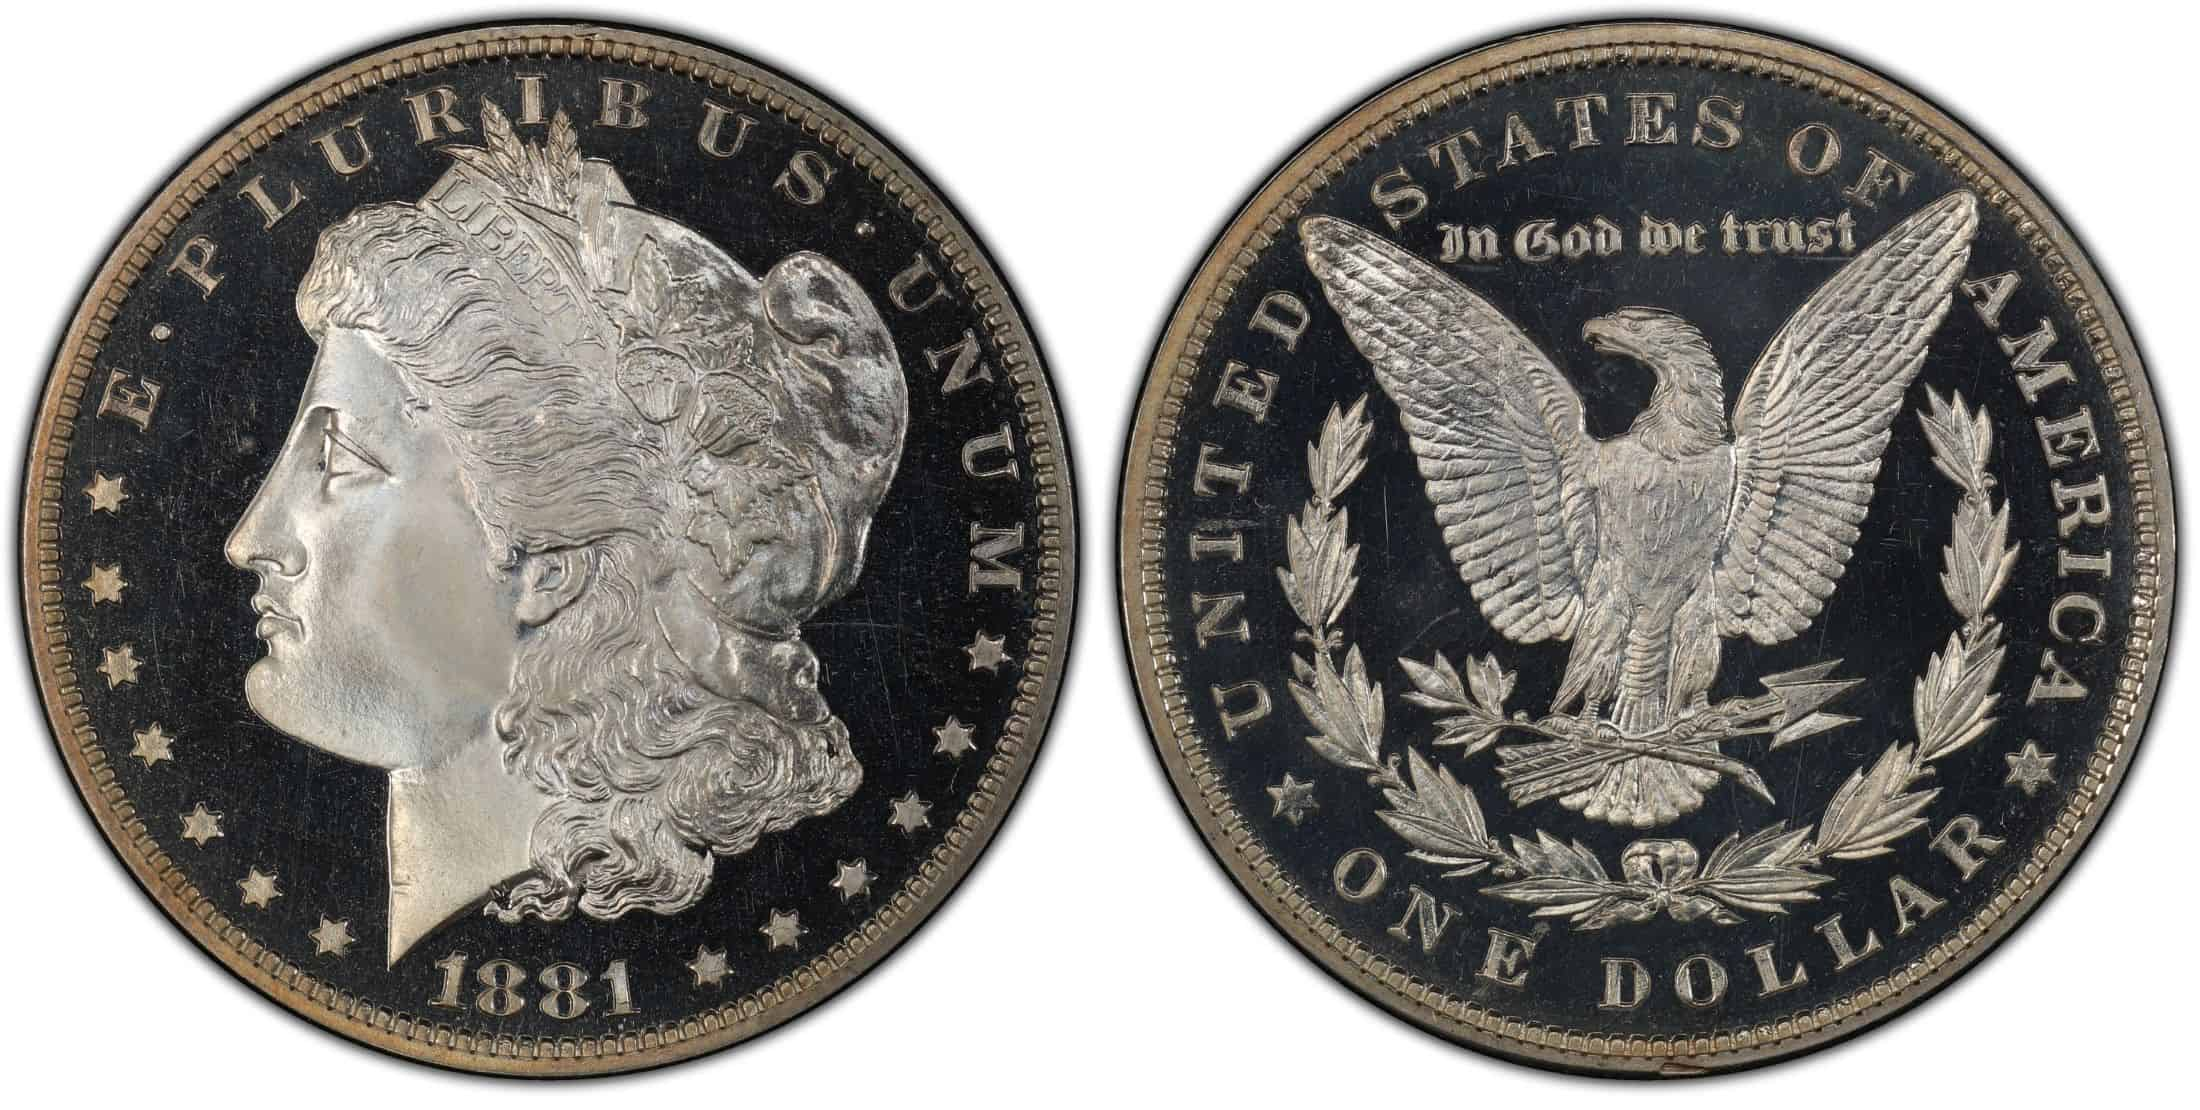 1881 proof Morgan silver dollar